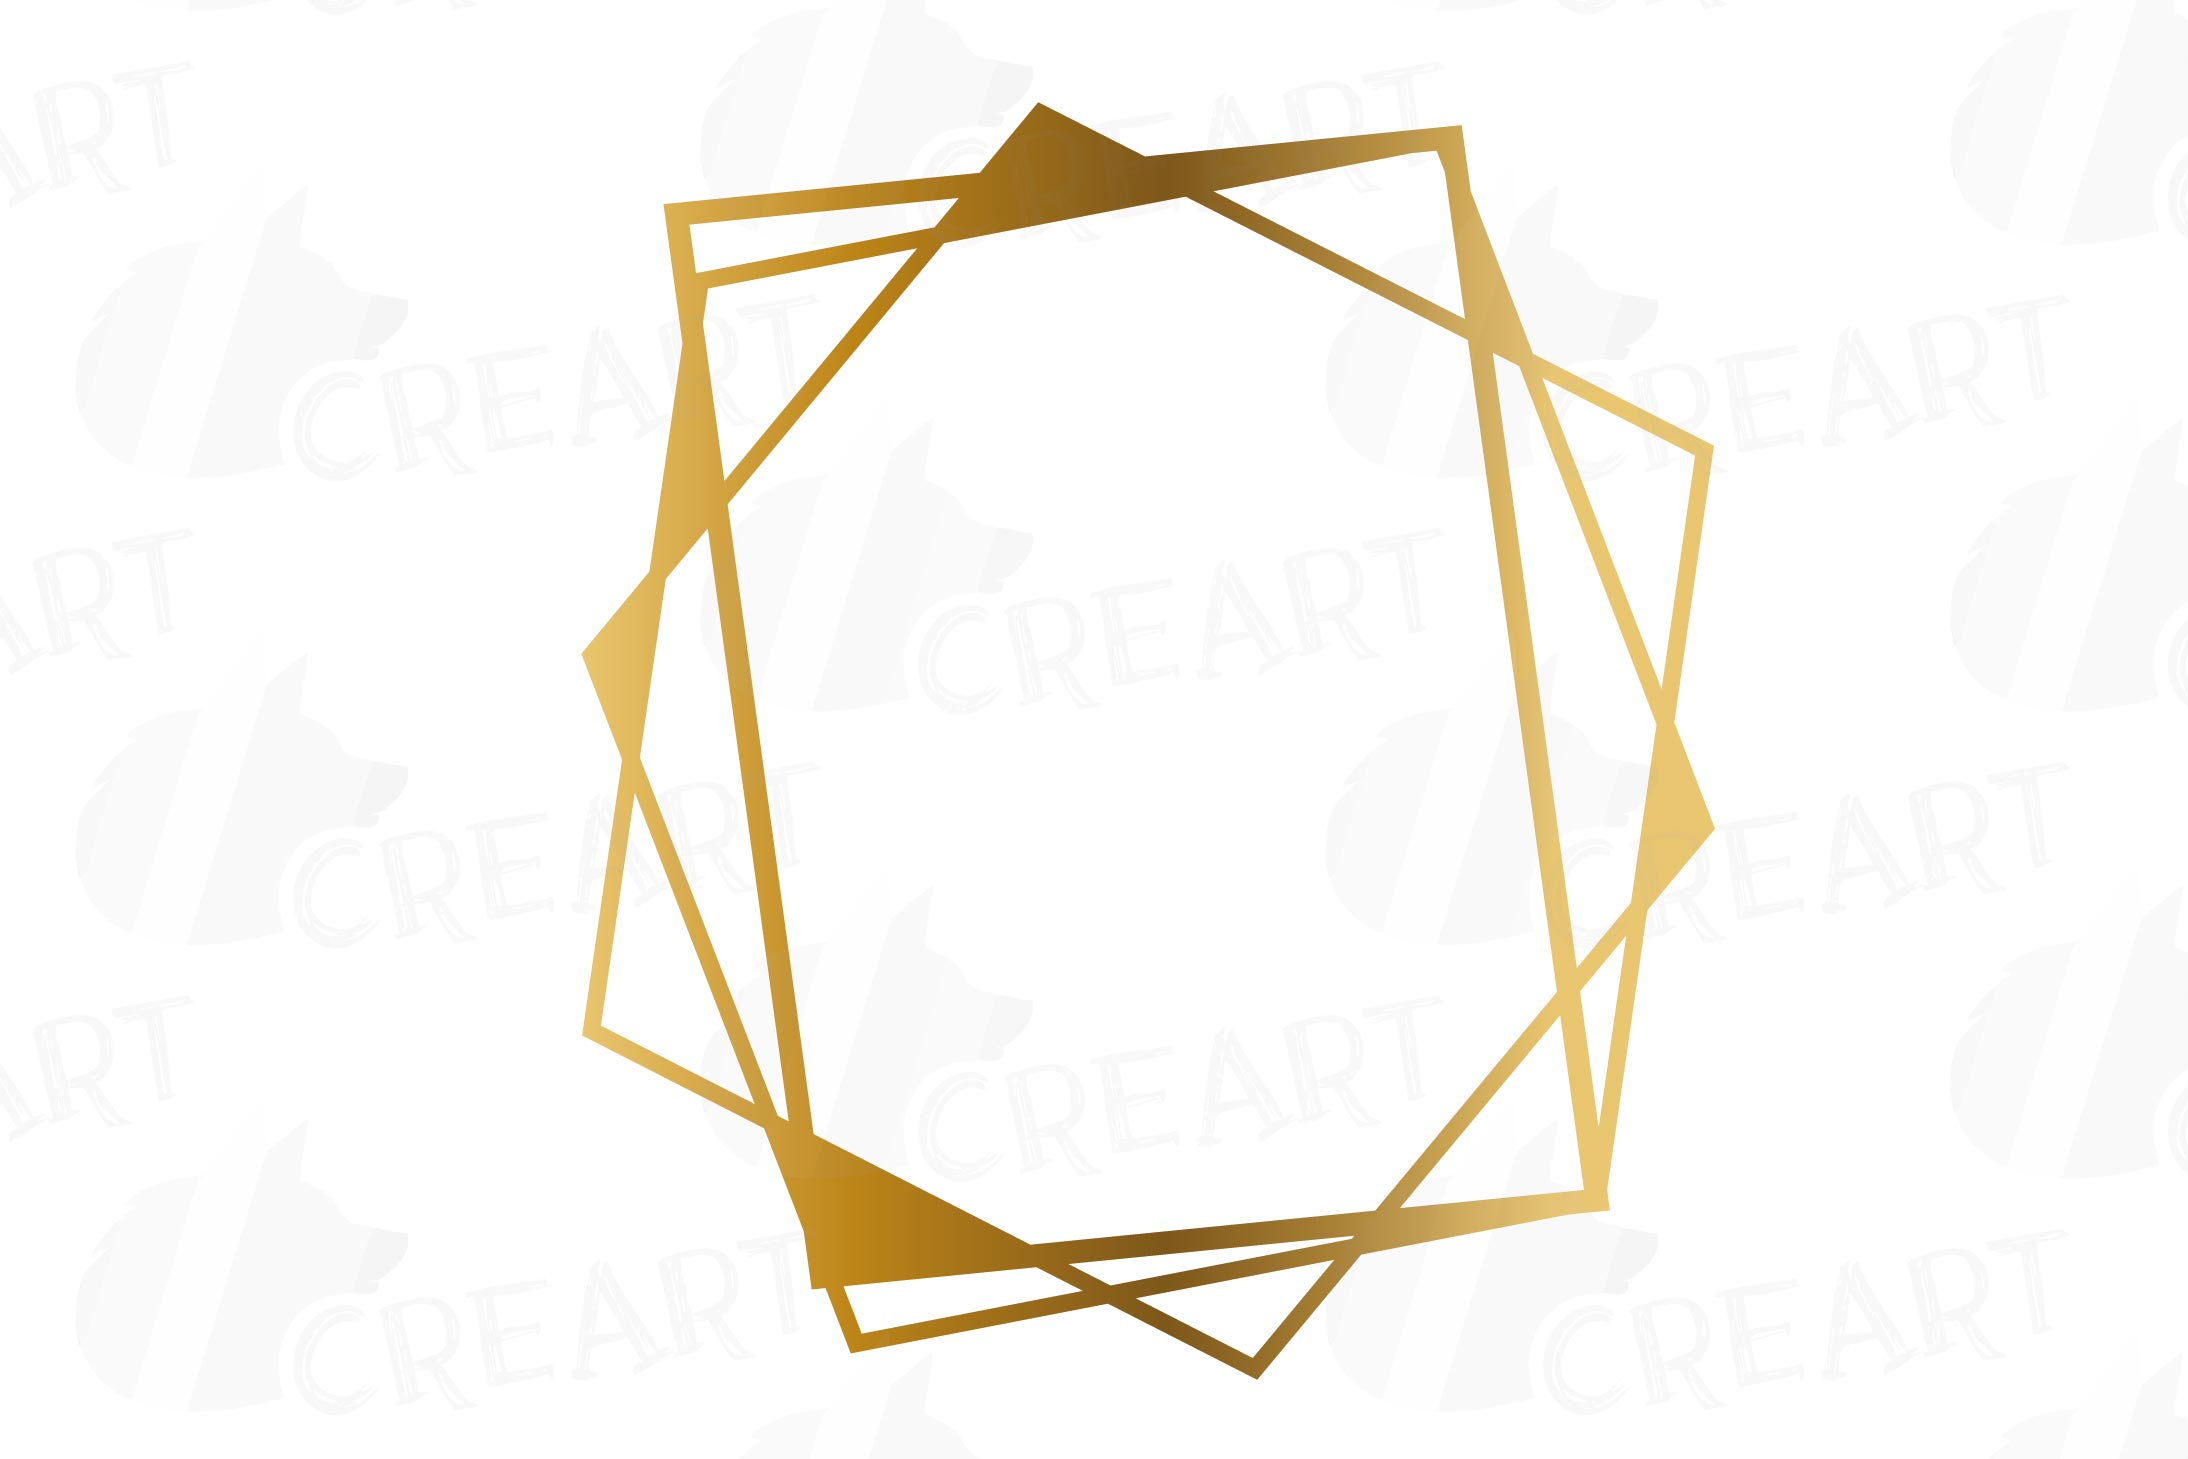 Chaotic geometric golden frames, lineal frames clip art.